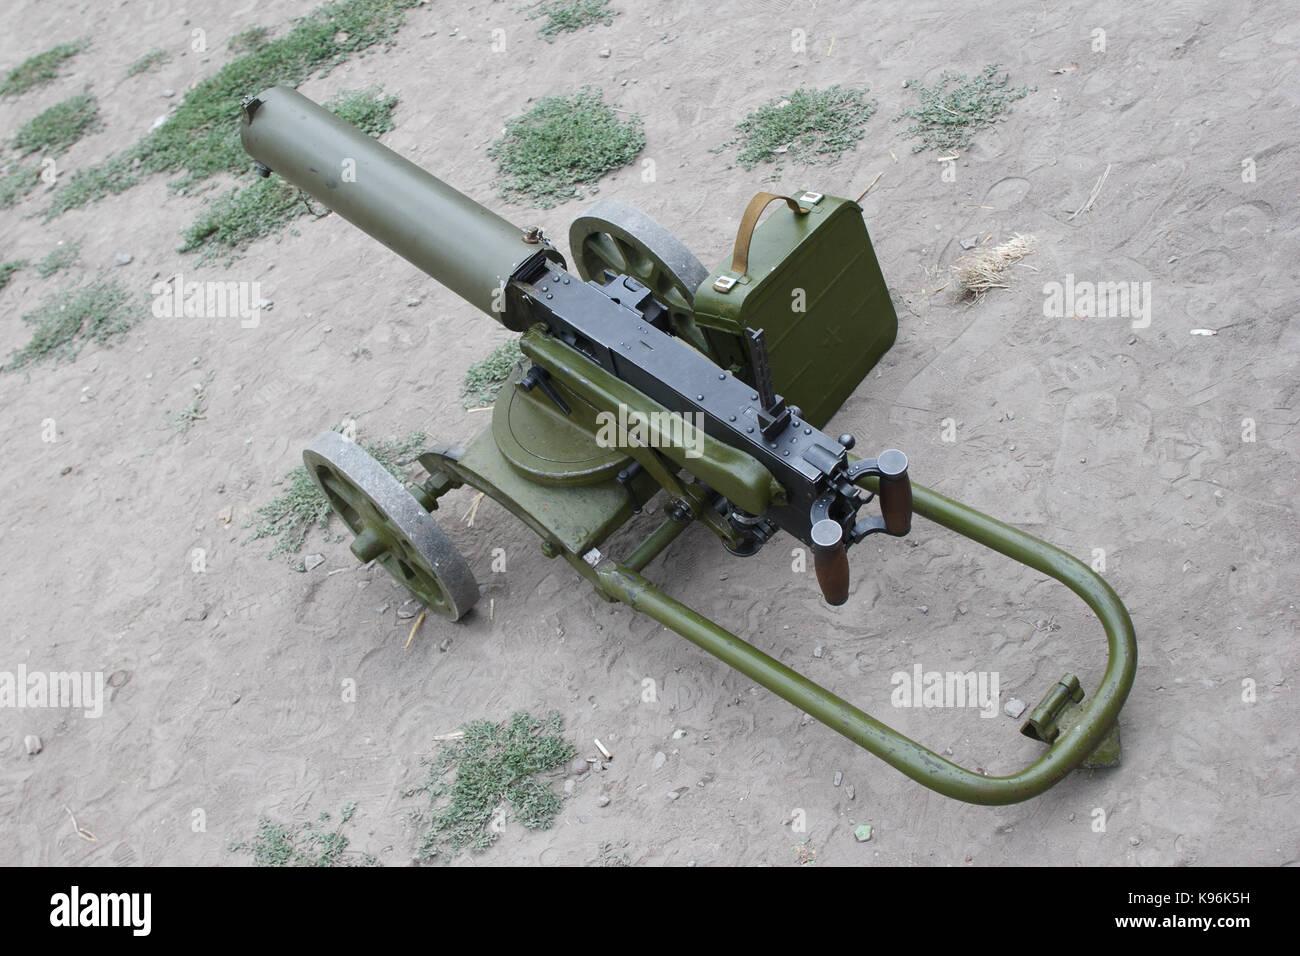 Machine Gun Ww1 Stock Photos & Machine Gun Ww1 Stock Images